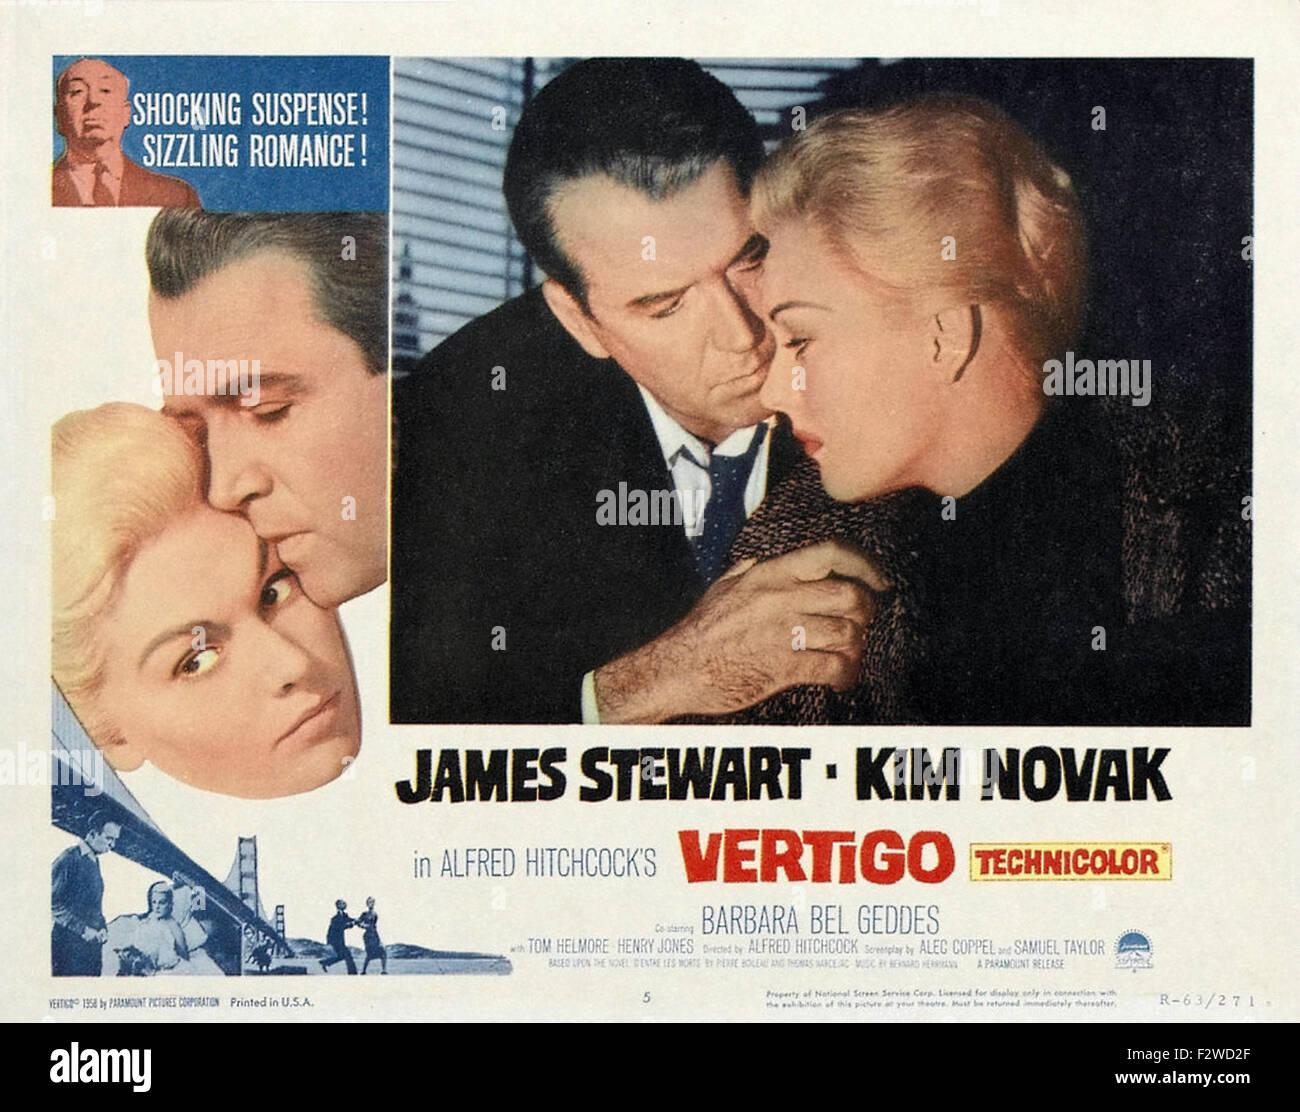 Vertigo - Movie Poster - Stock Image